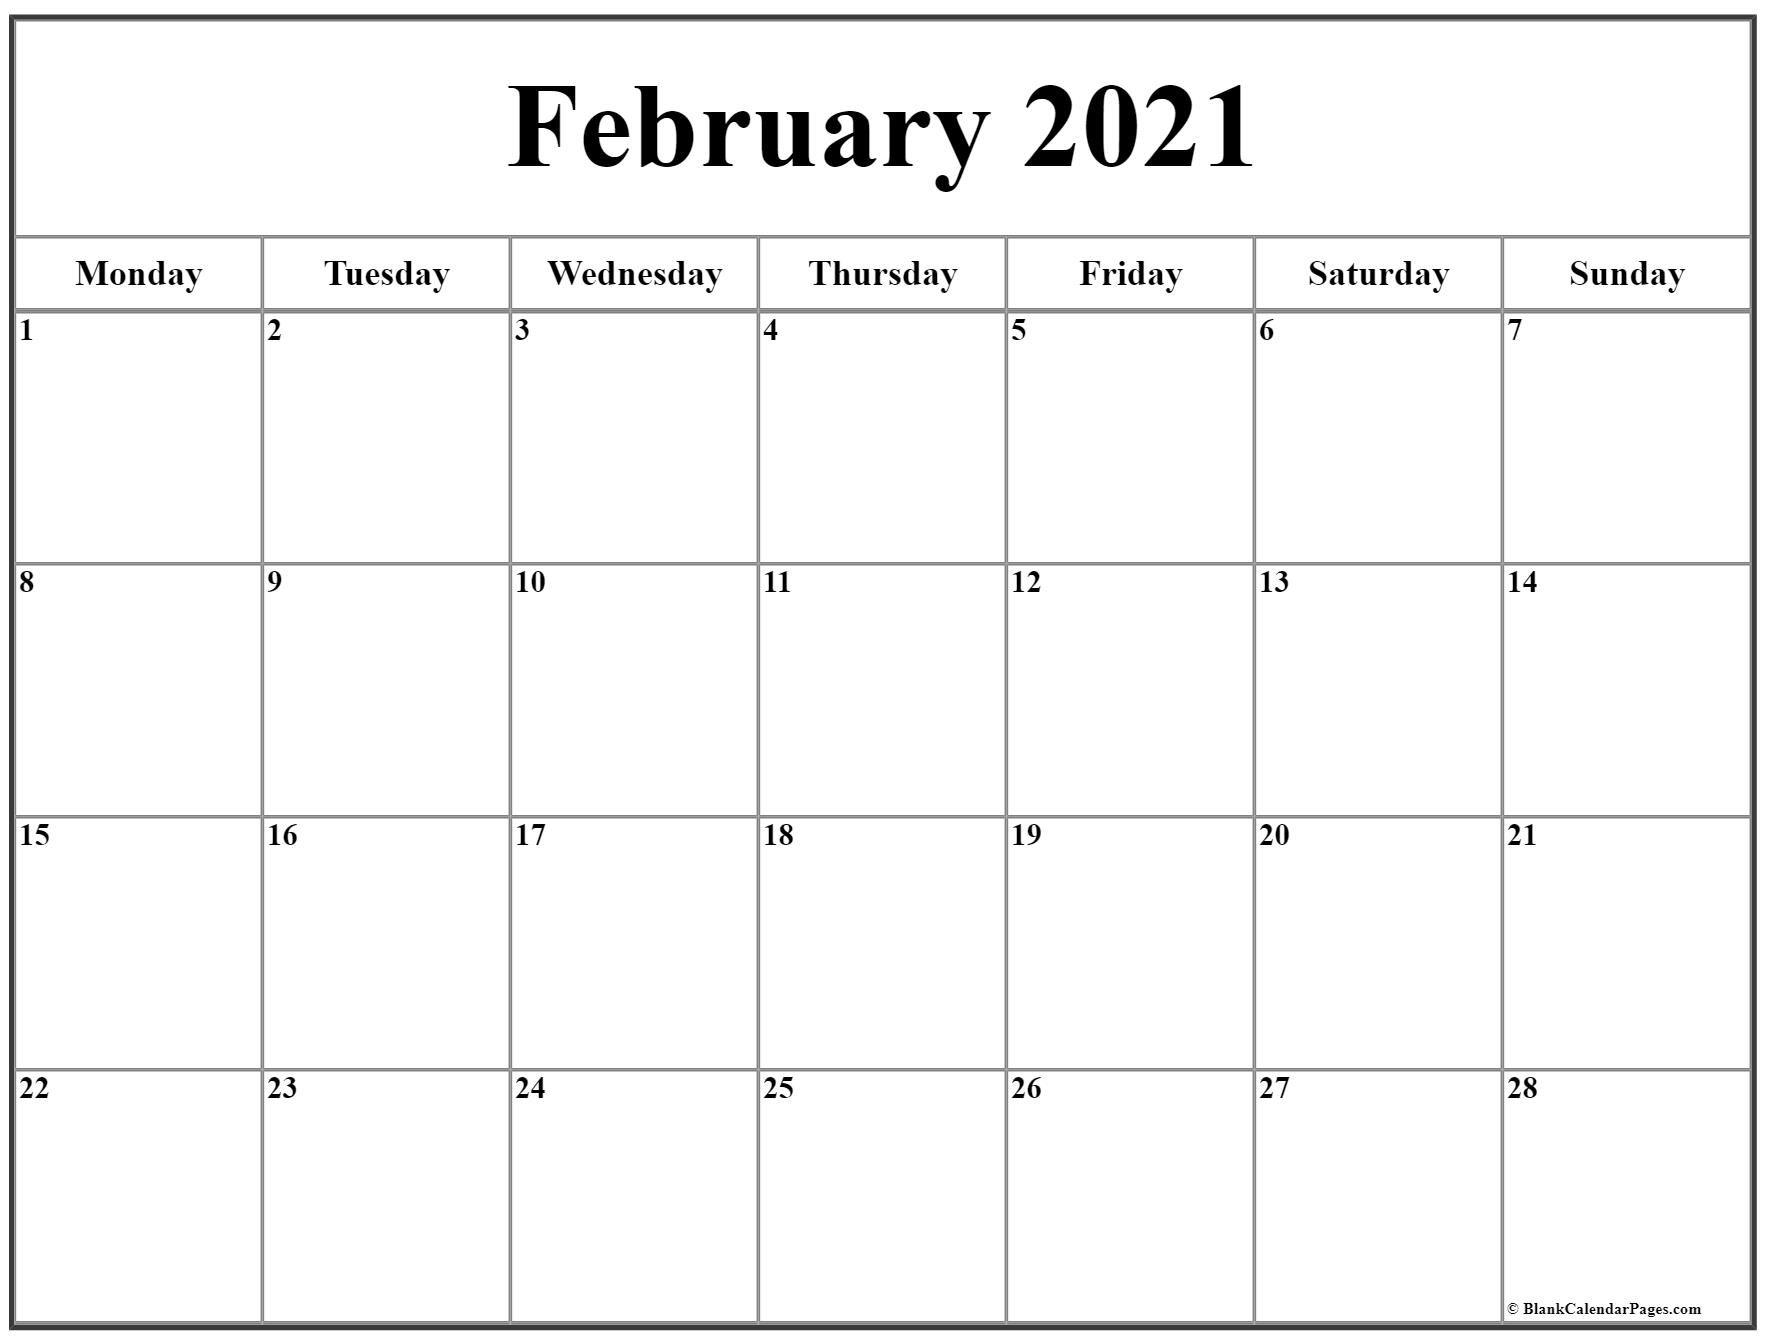 february 2021 monday calendar | monday to sunday